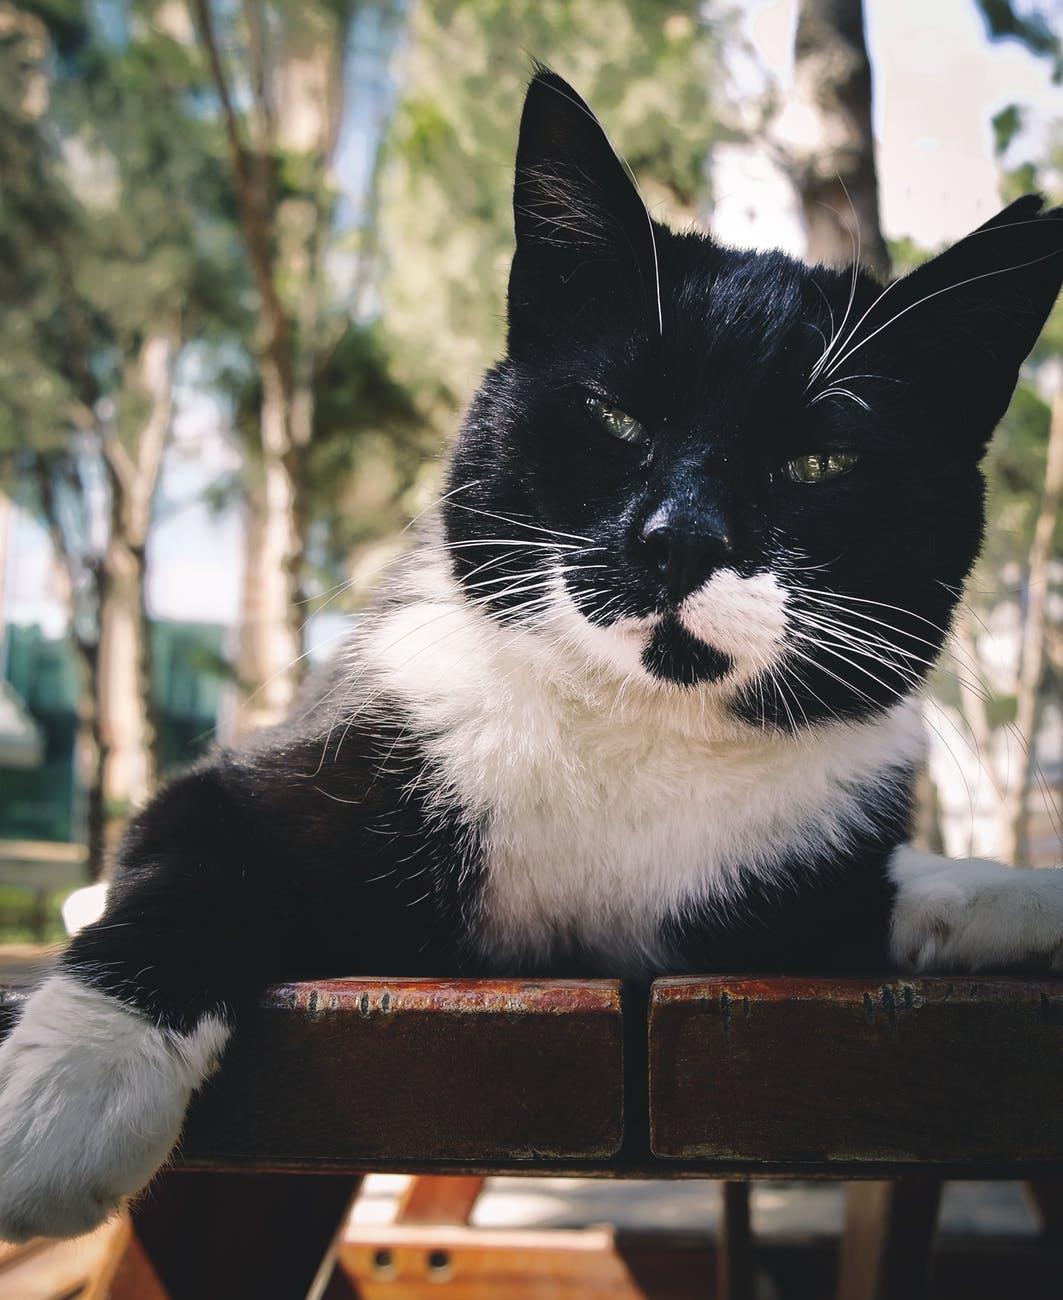 short fur black and white cat